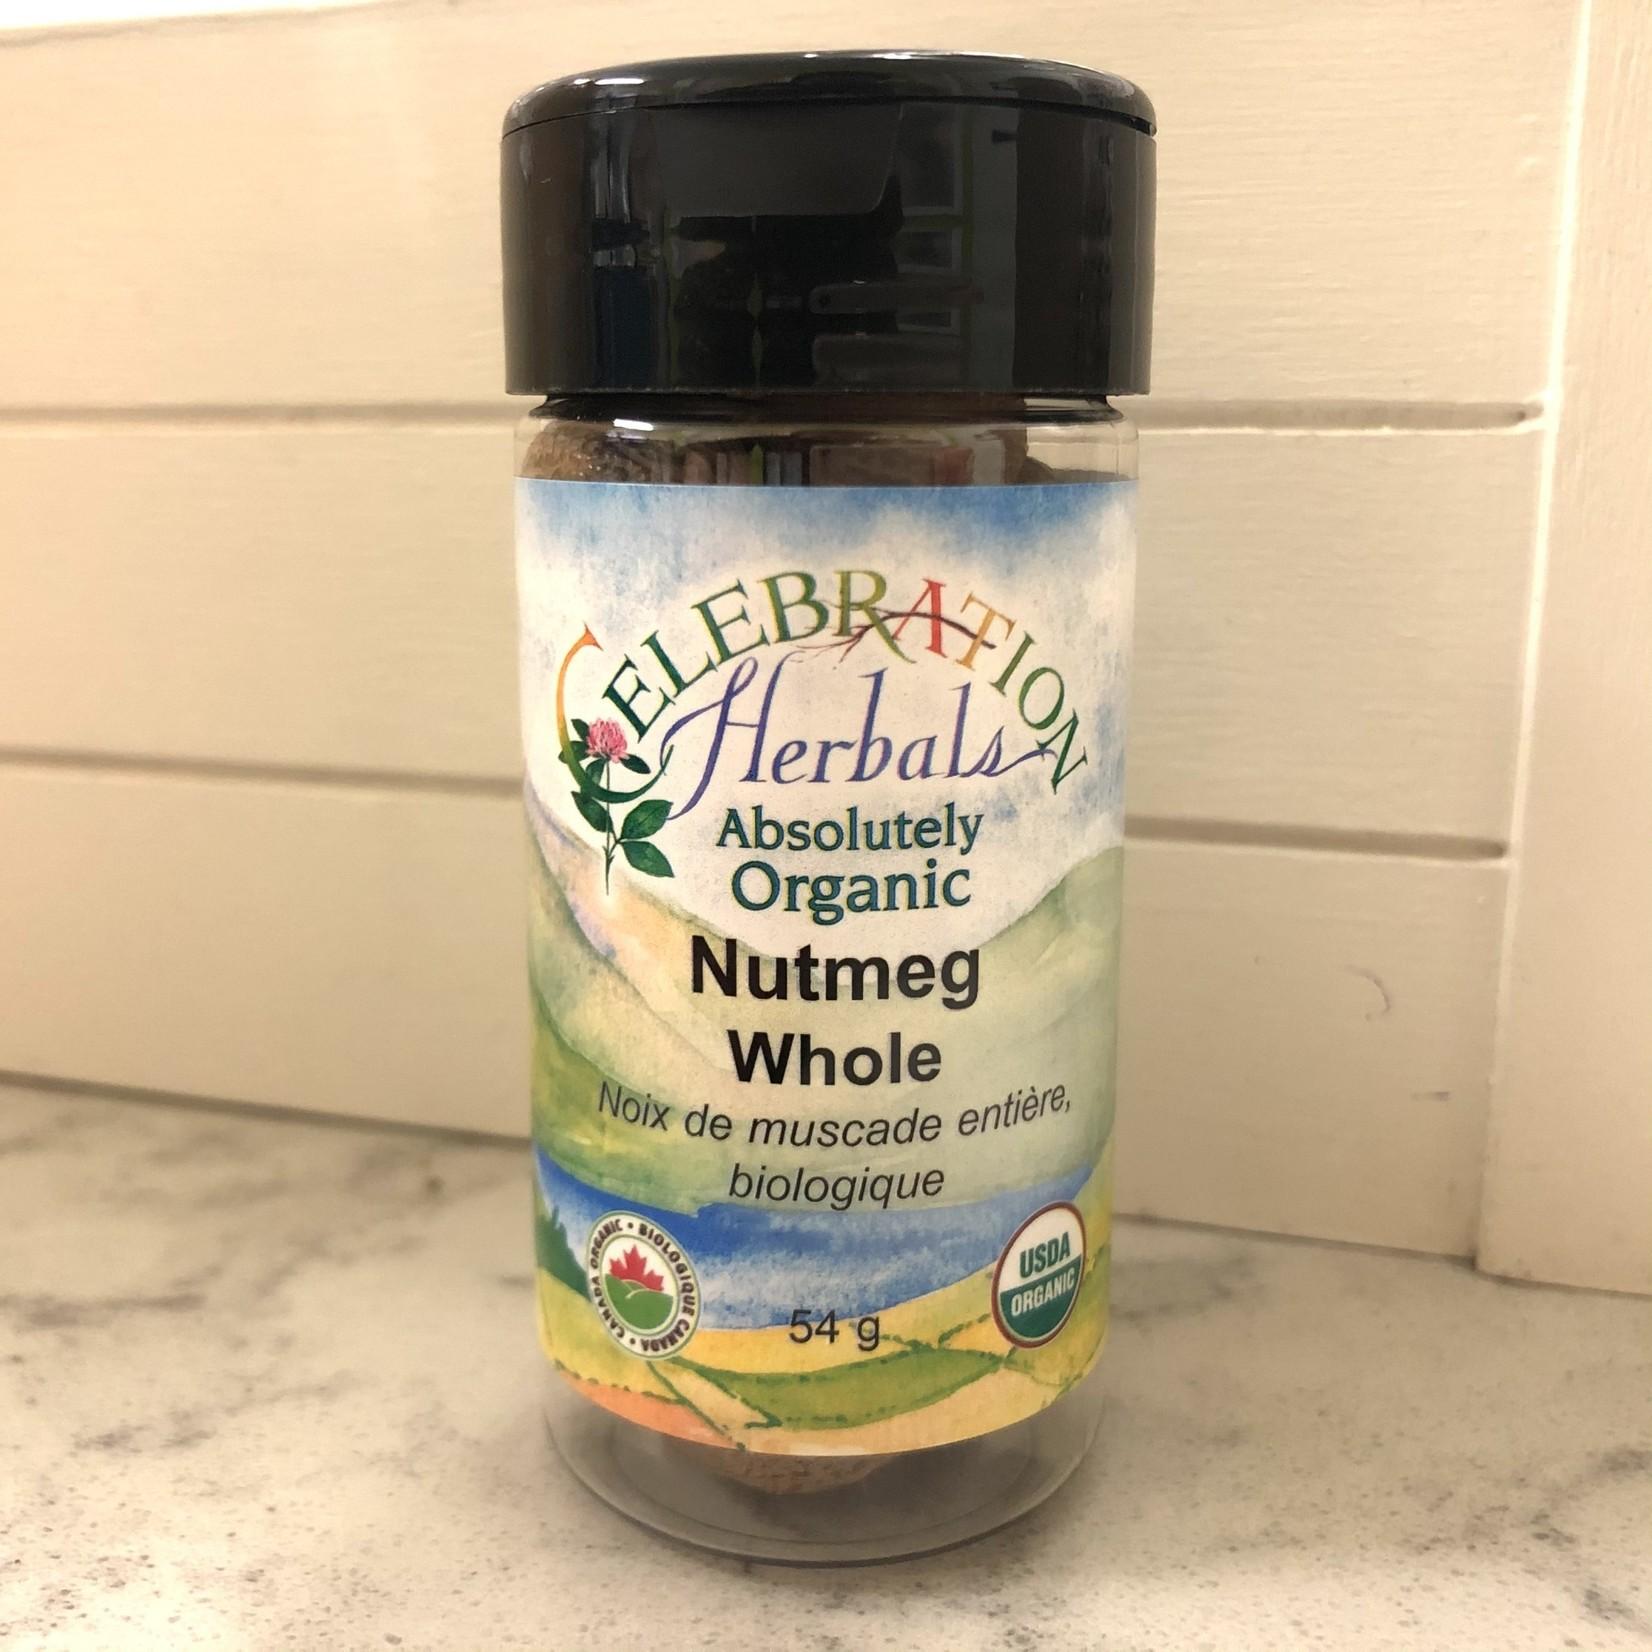 Celebration Herbals Celebration Herbals Whole Nutmeg 54g